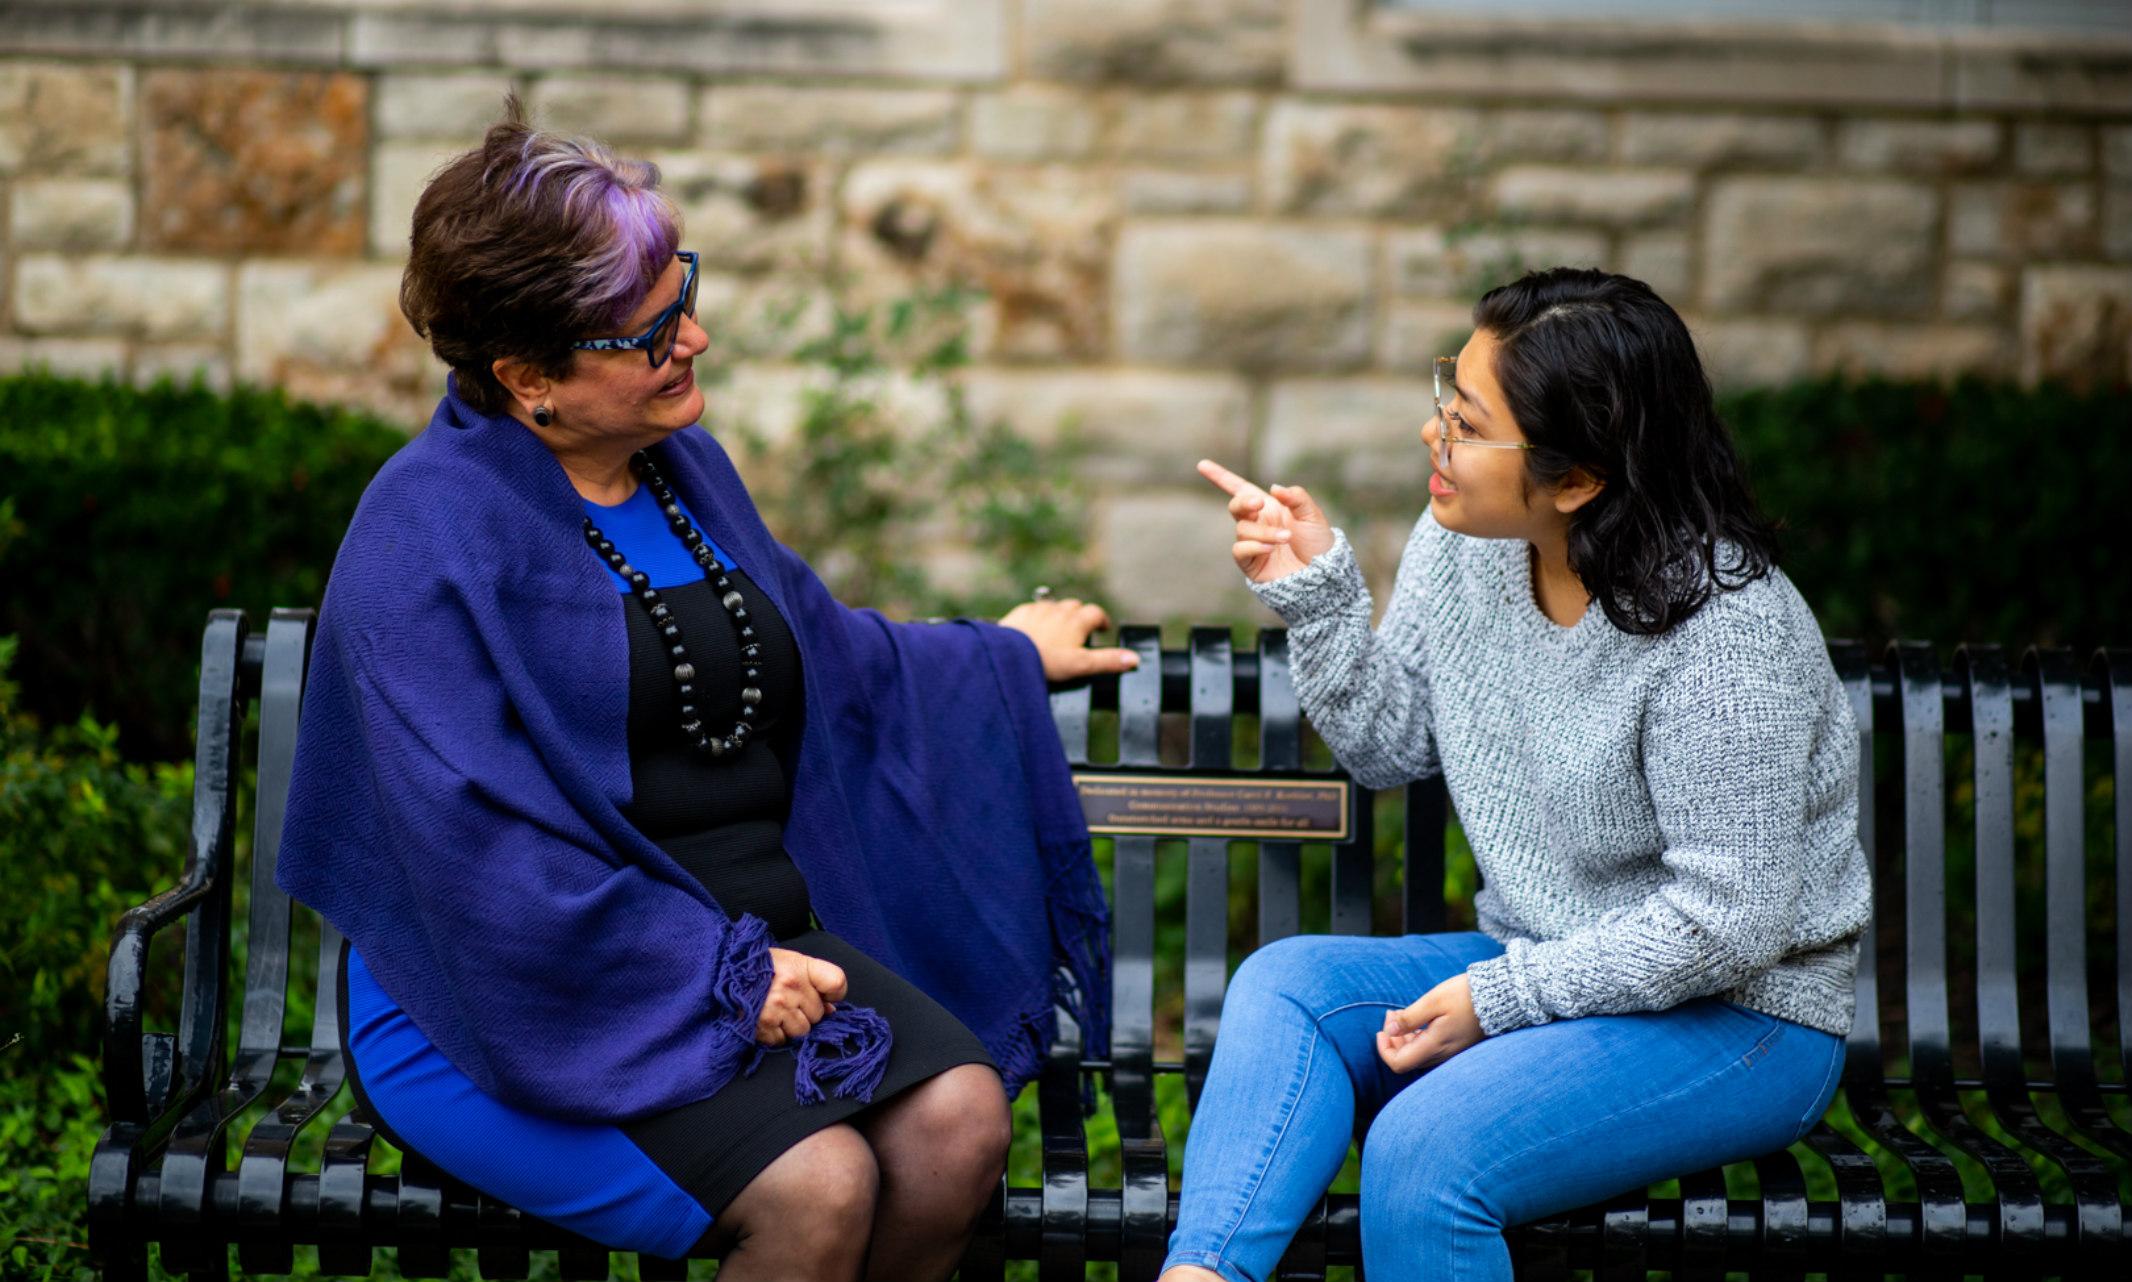 Choa Saidān Shāh unattractive christian women dating